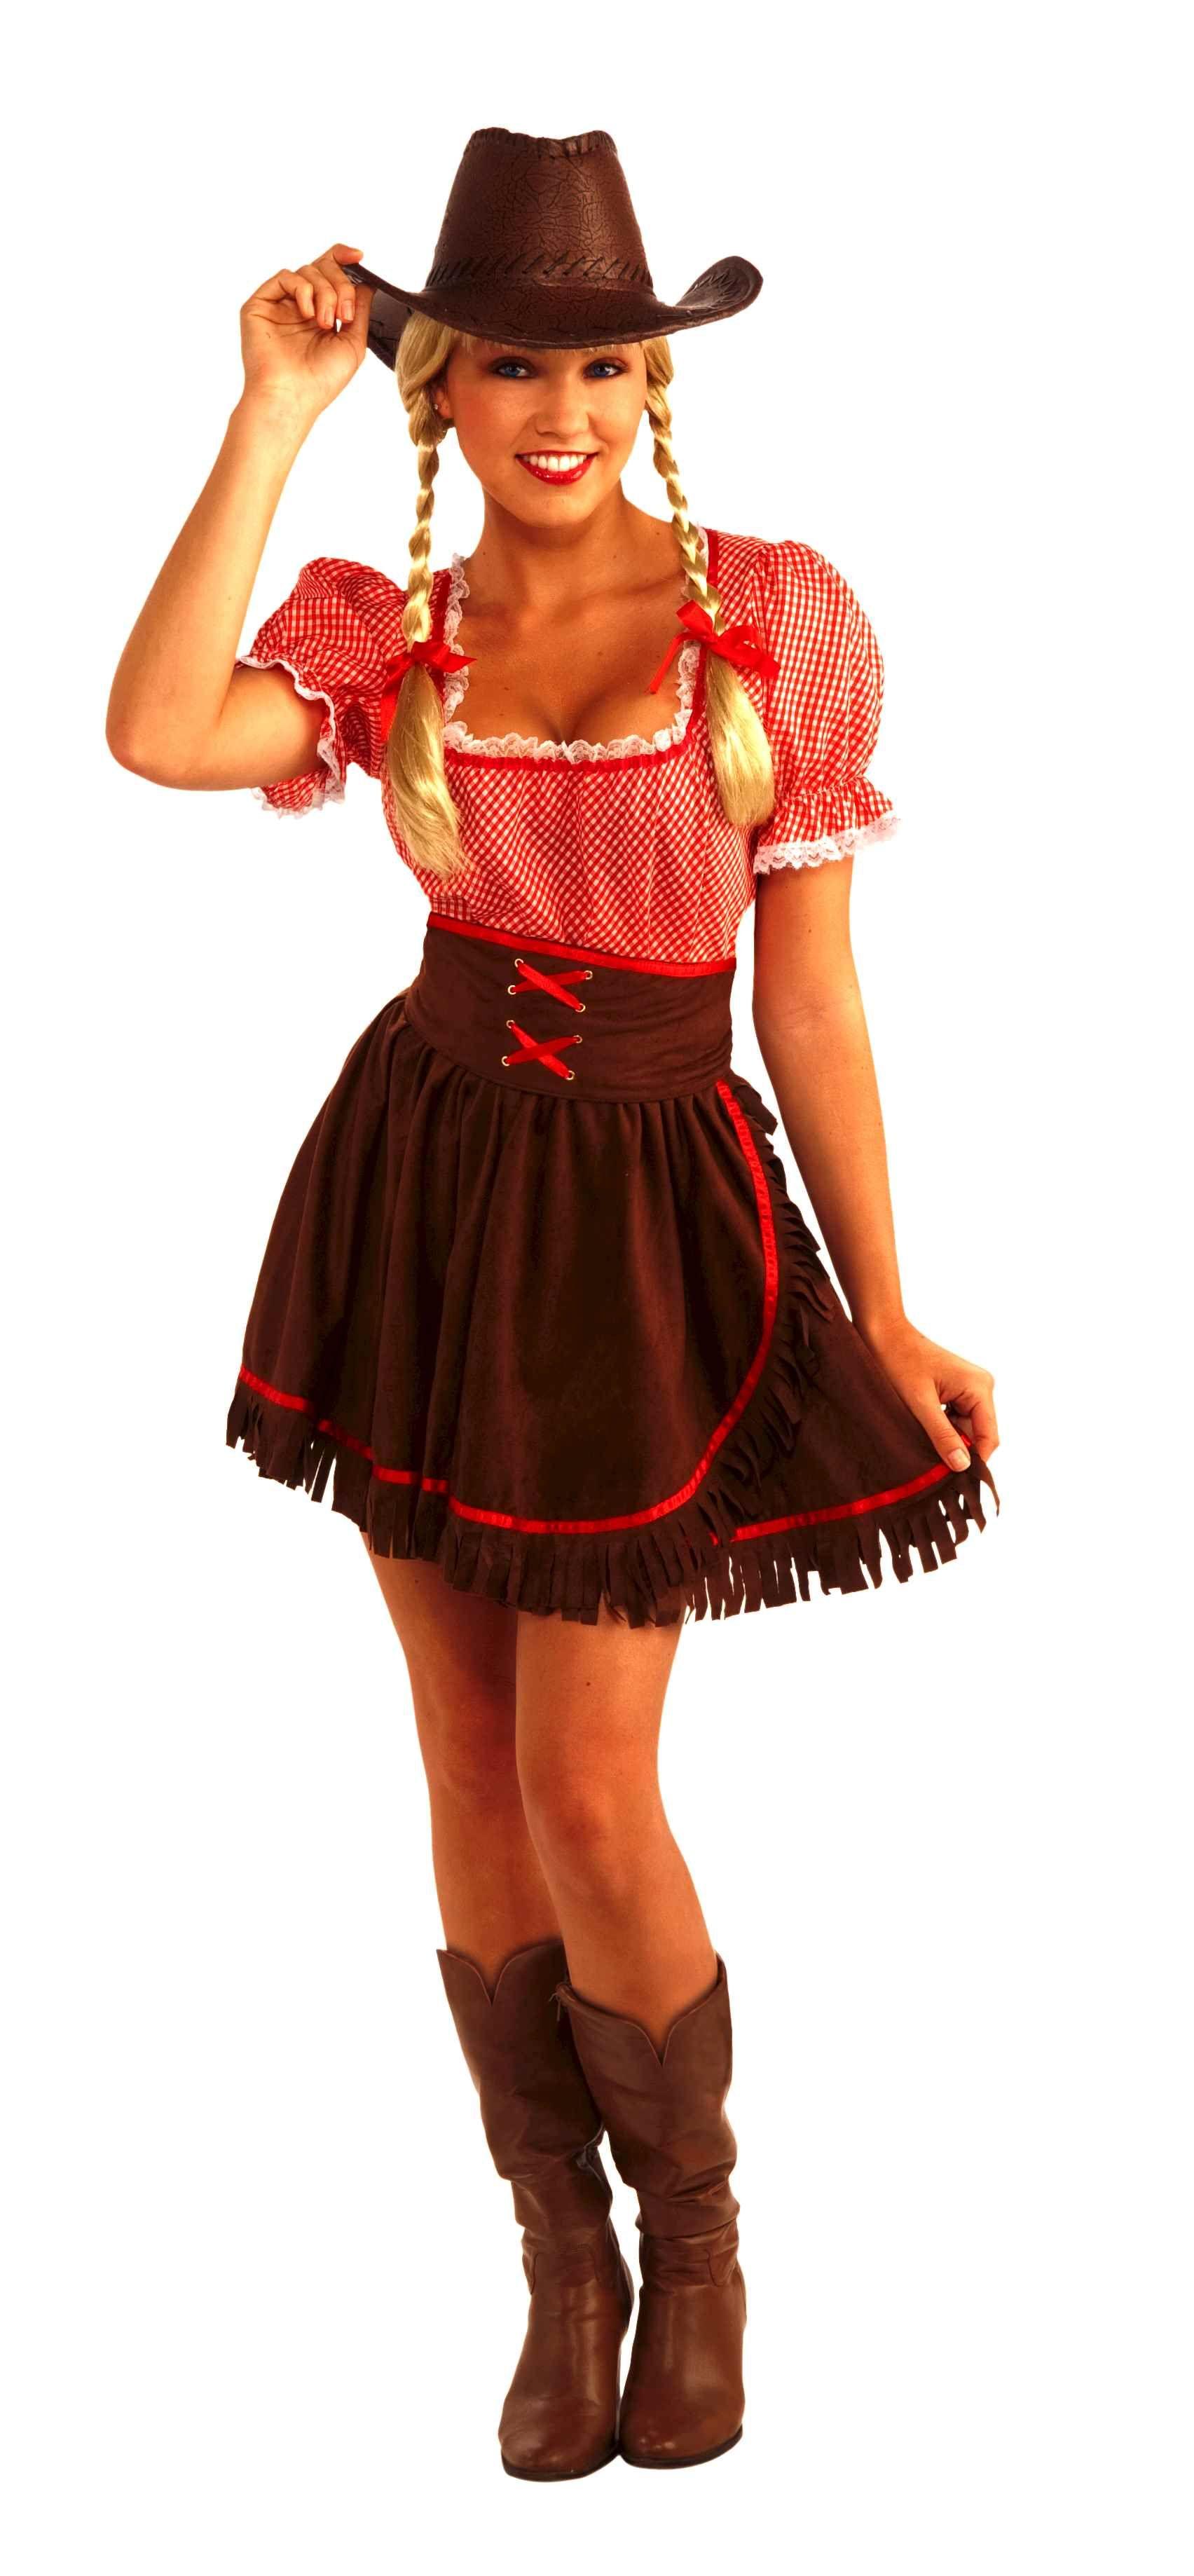 Home ladies costumes rodeo gal costume - Western Square Dancing Cowpoke Cutie Dress Costume